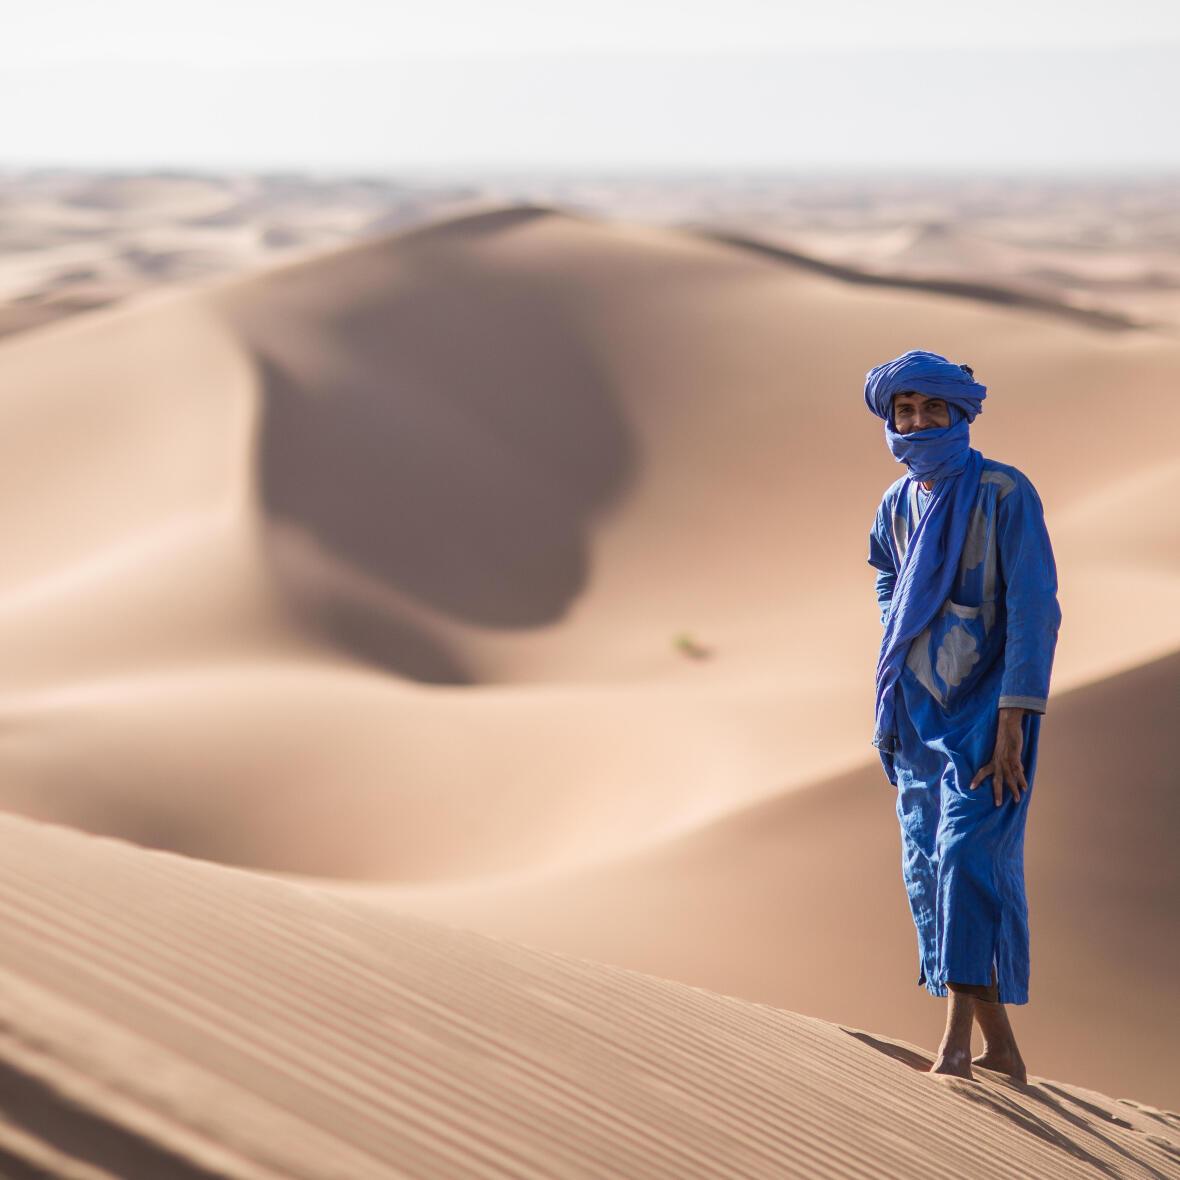 Bédouin Touareg du Sahara au Maroc